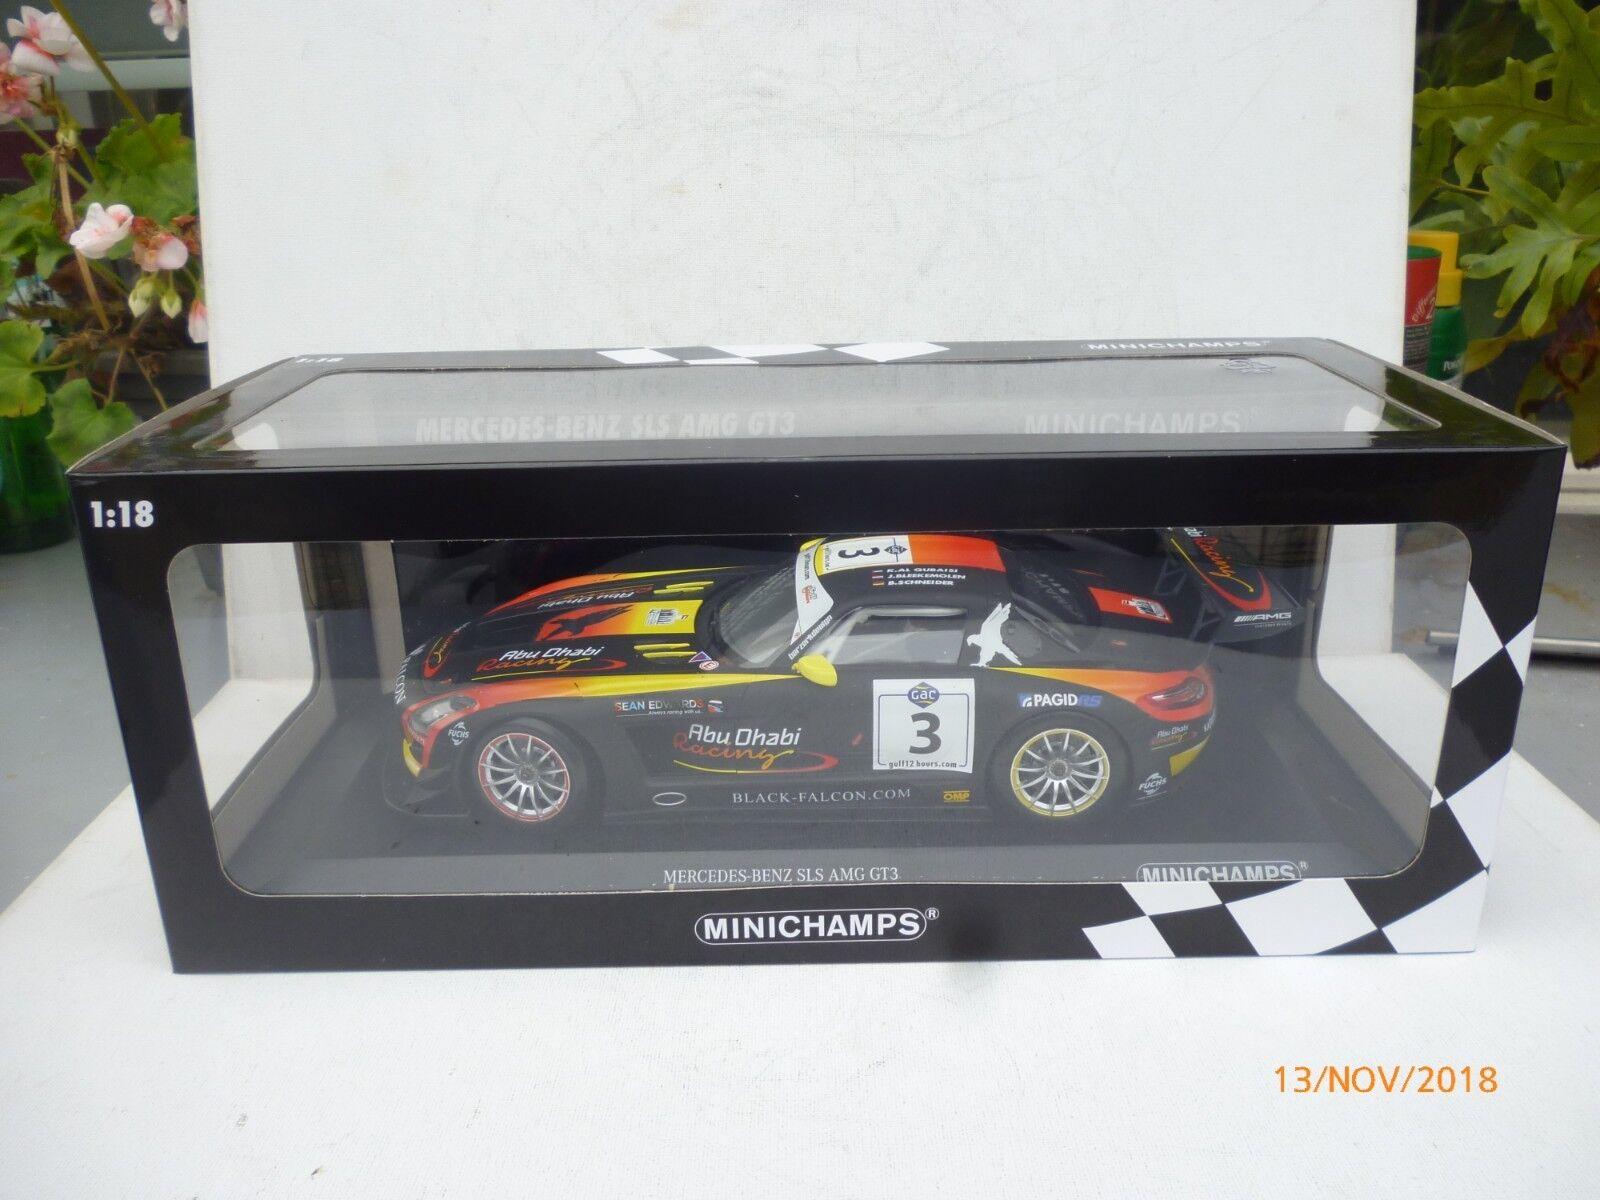 MINICHAMPS - 1 18 - MERCEDES-BENZ SLS AMG GT3 - WINNER GULF  ABU DHABINEW OVP